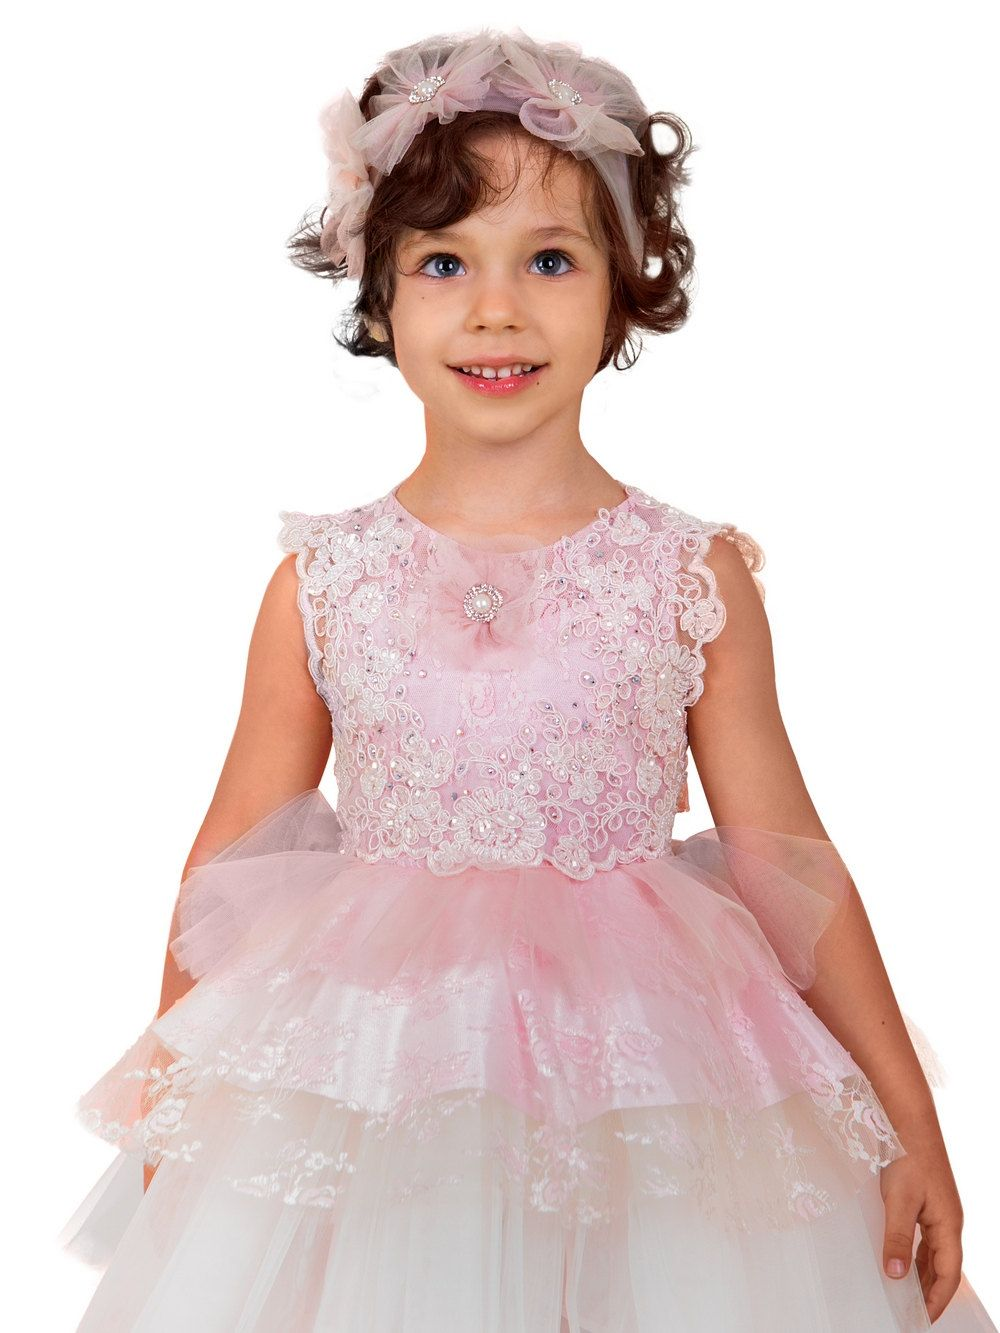 Pink flower dress birthday bridesmaid girl party dress for pink flower dress birthday bridesmaid girl party dress for princess satin dress party girl birthday gift ombrellifo Gallery